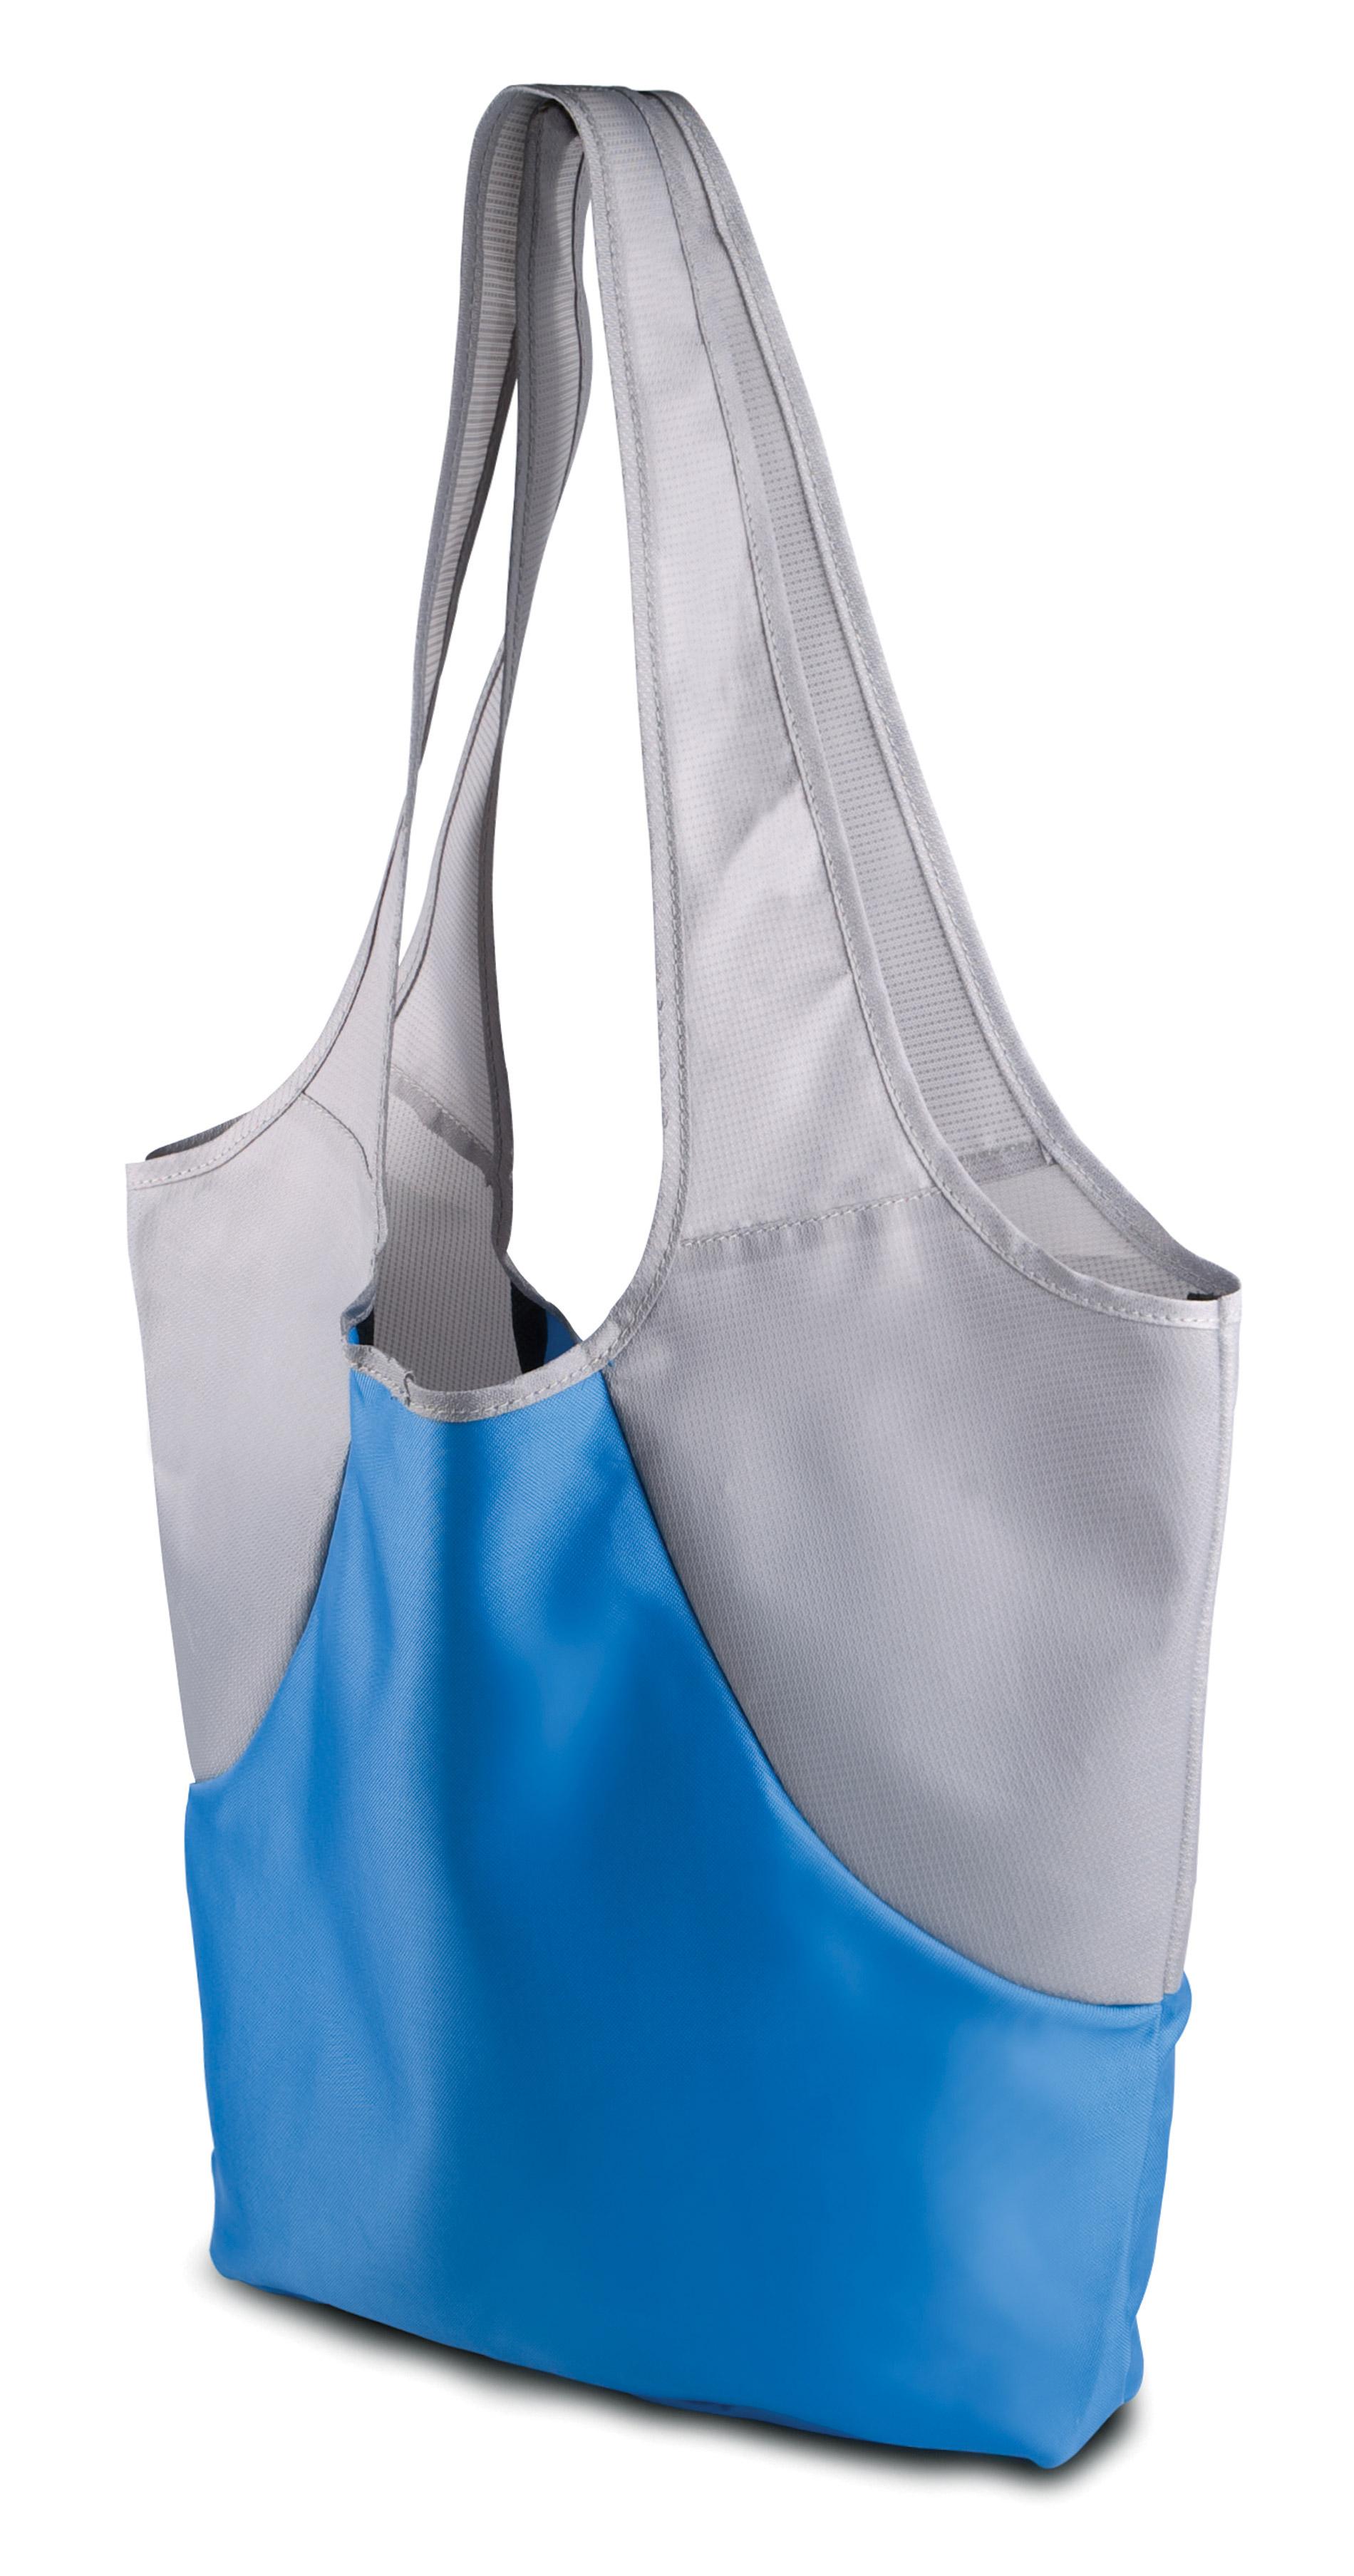 Aqua blue - light grey ki0201